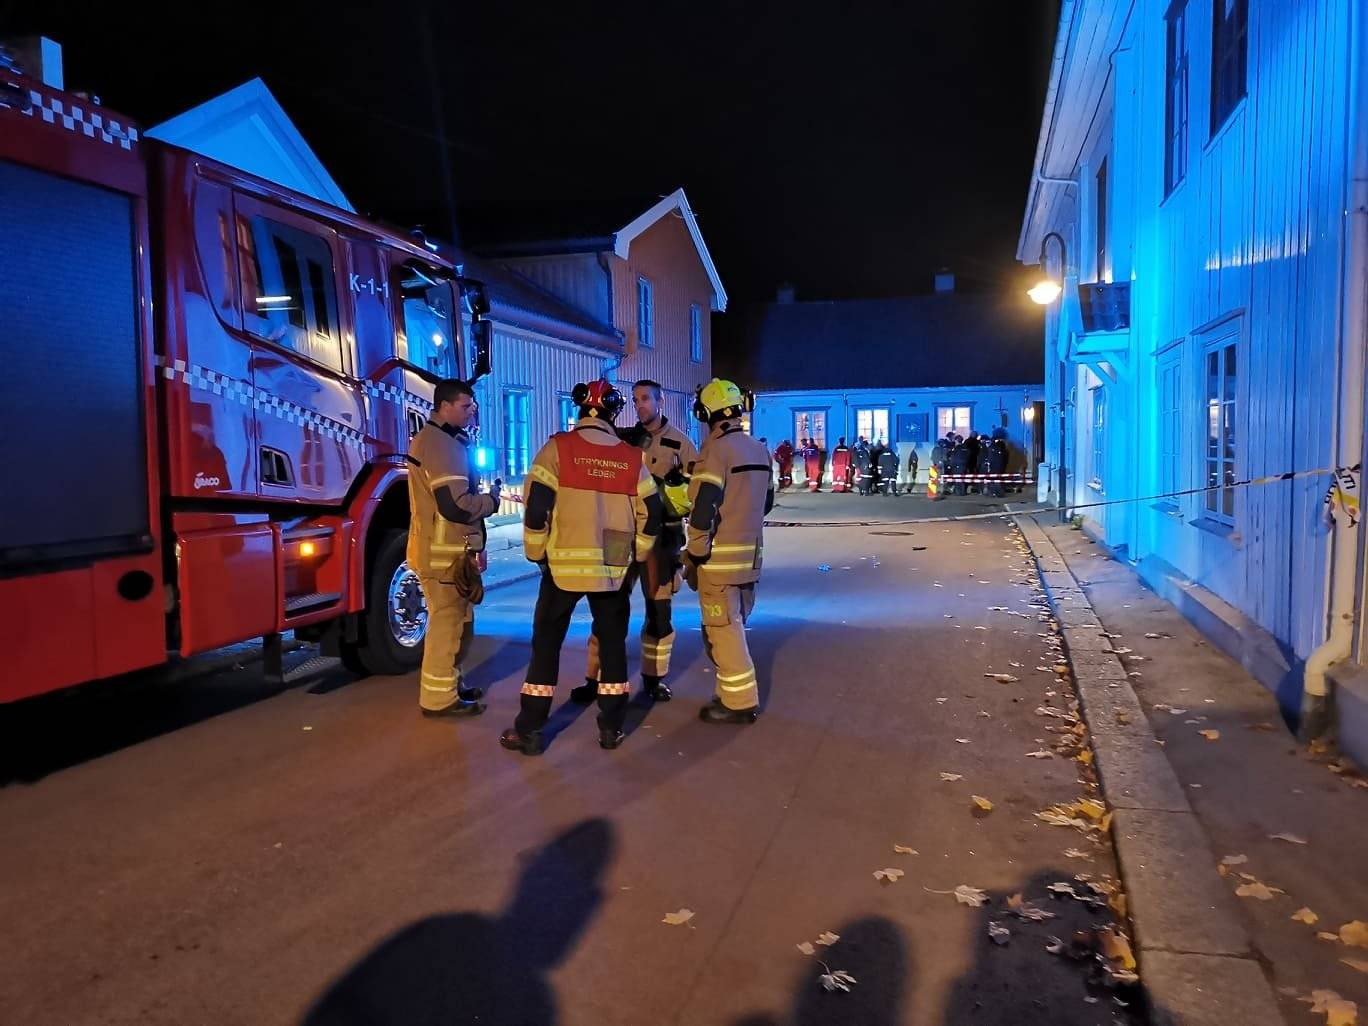 Attacco in Norvegia - Foto di Twitter